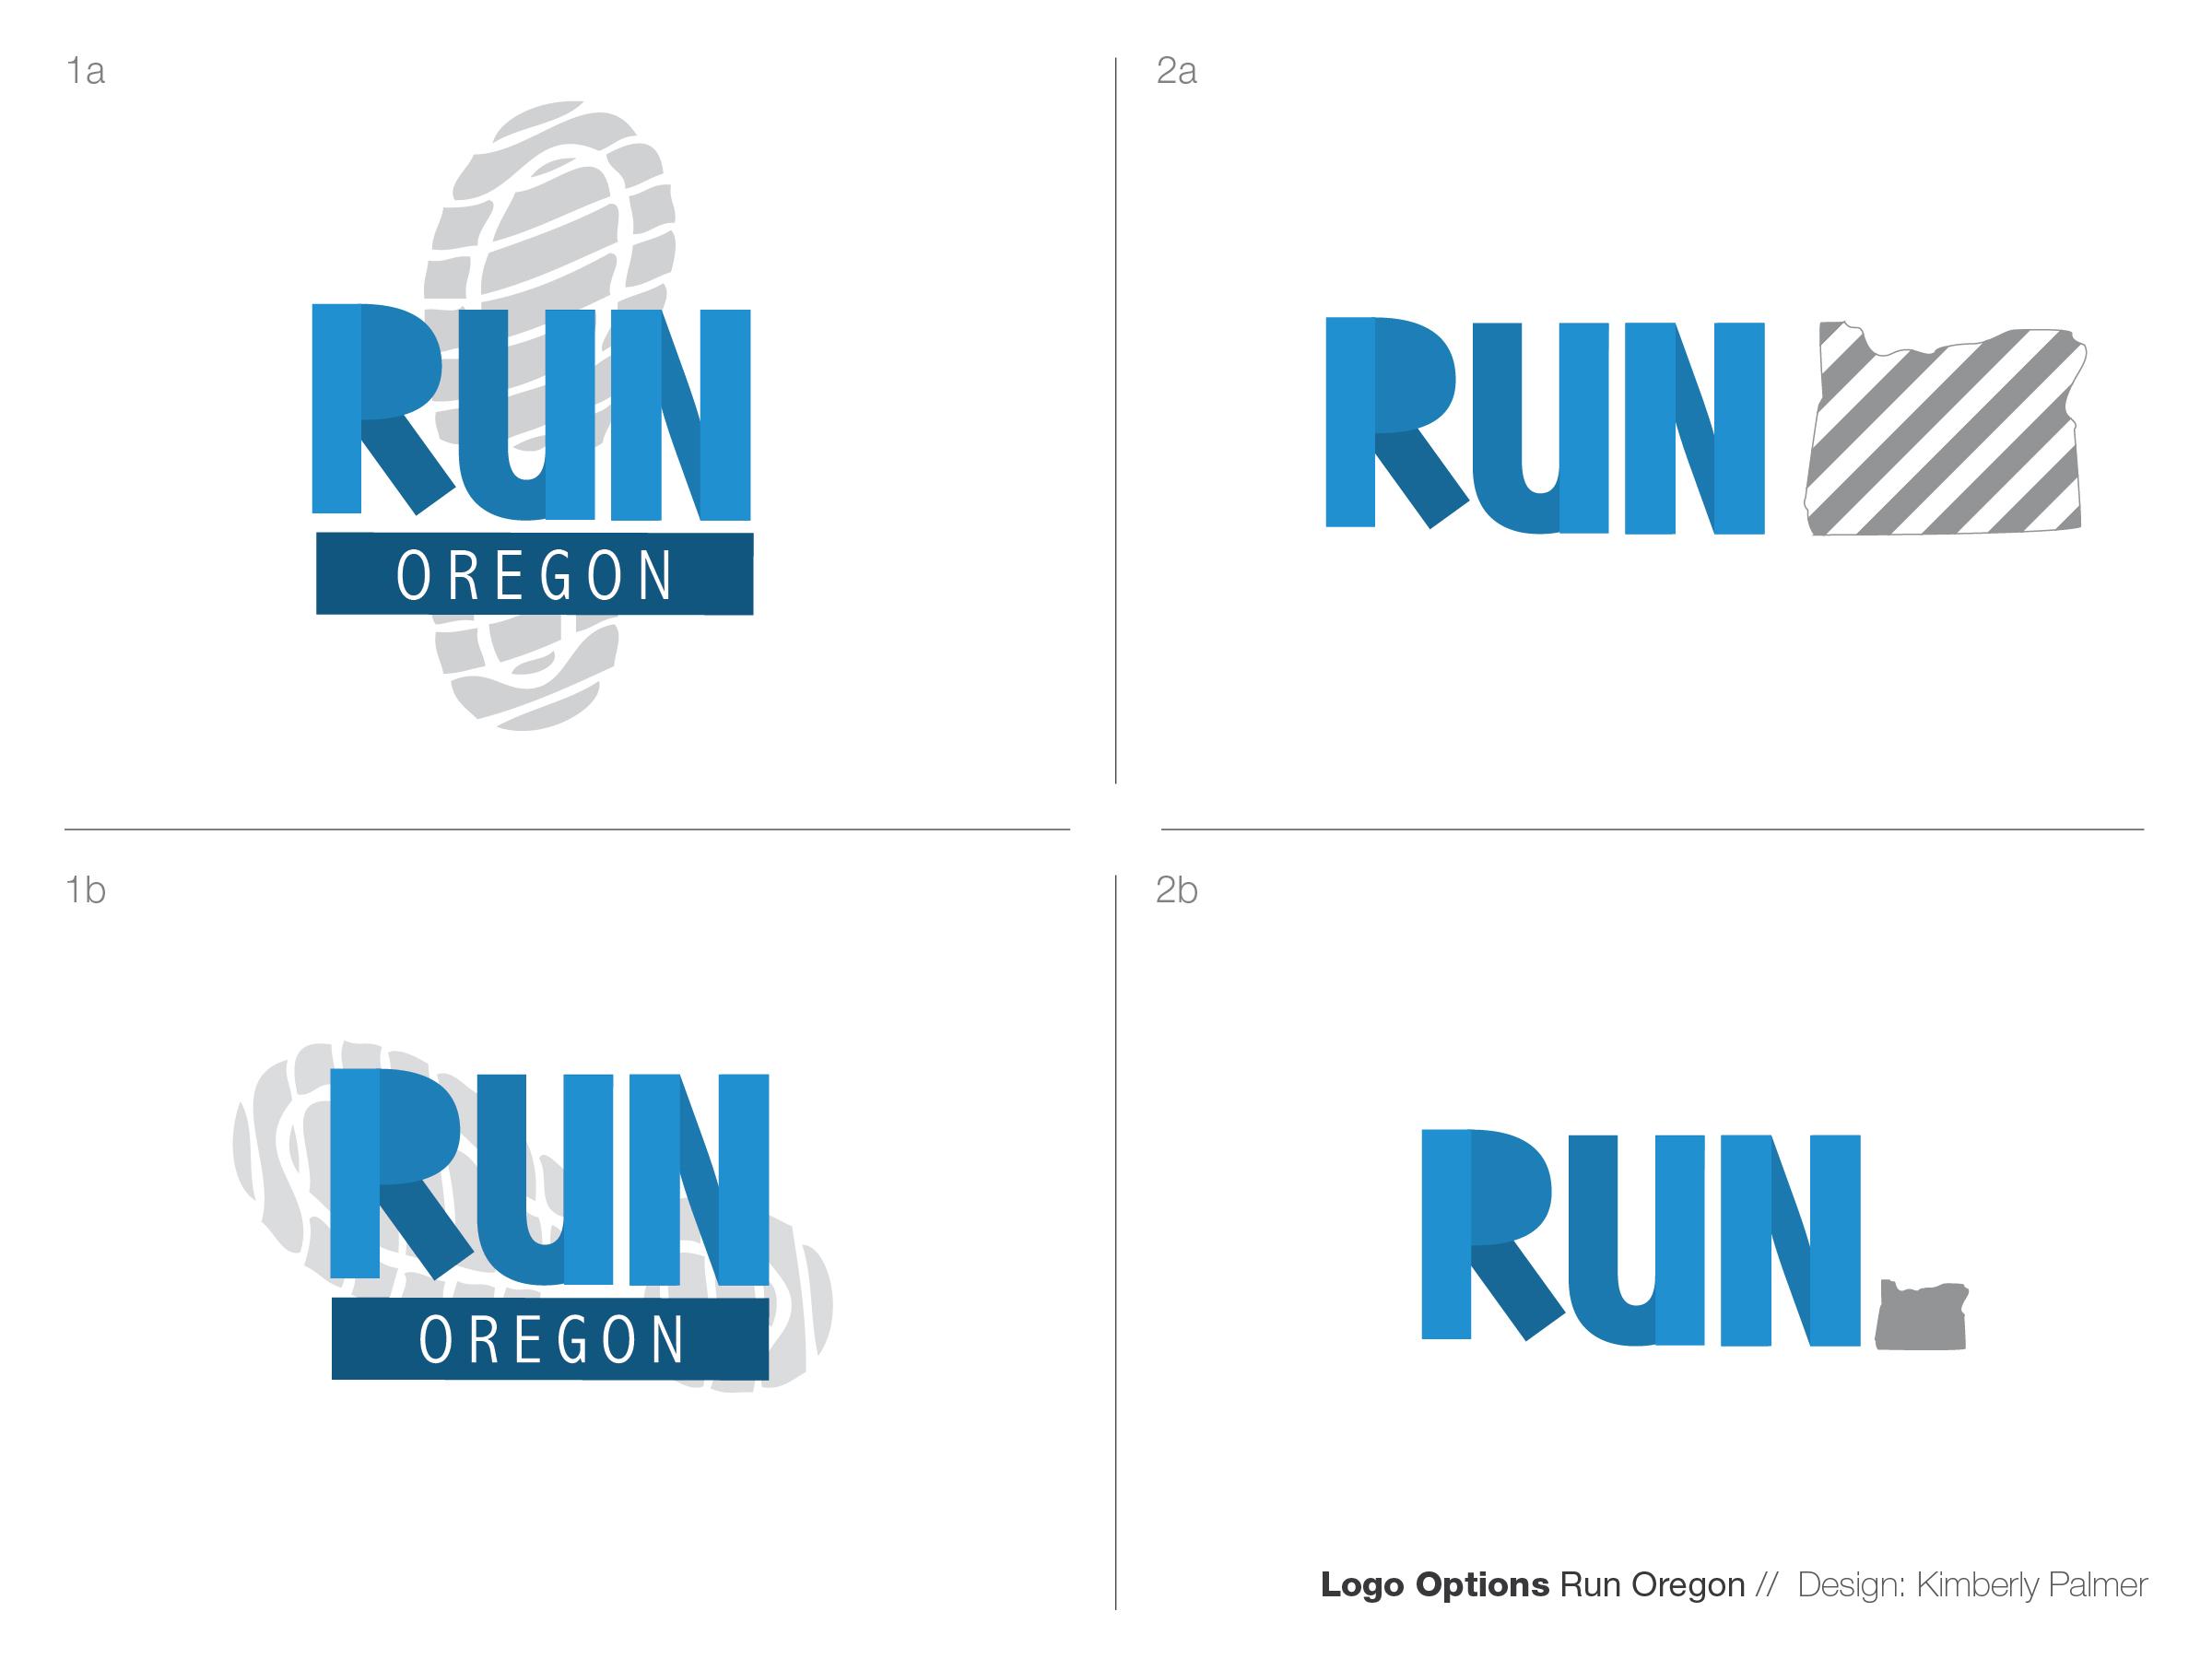 Run-Oregon Logo by Kimberly Palmer